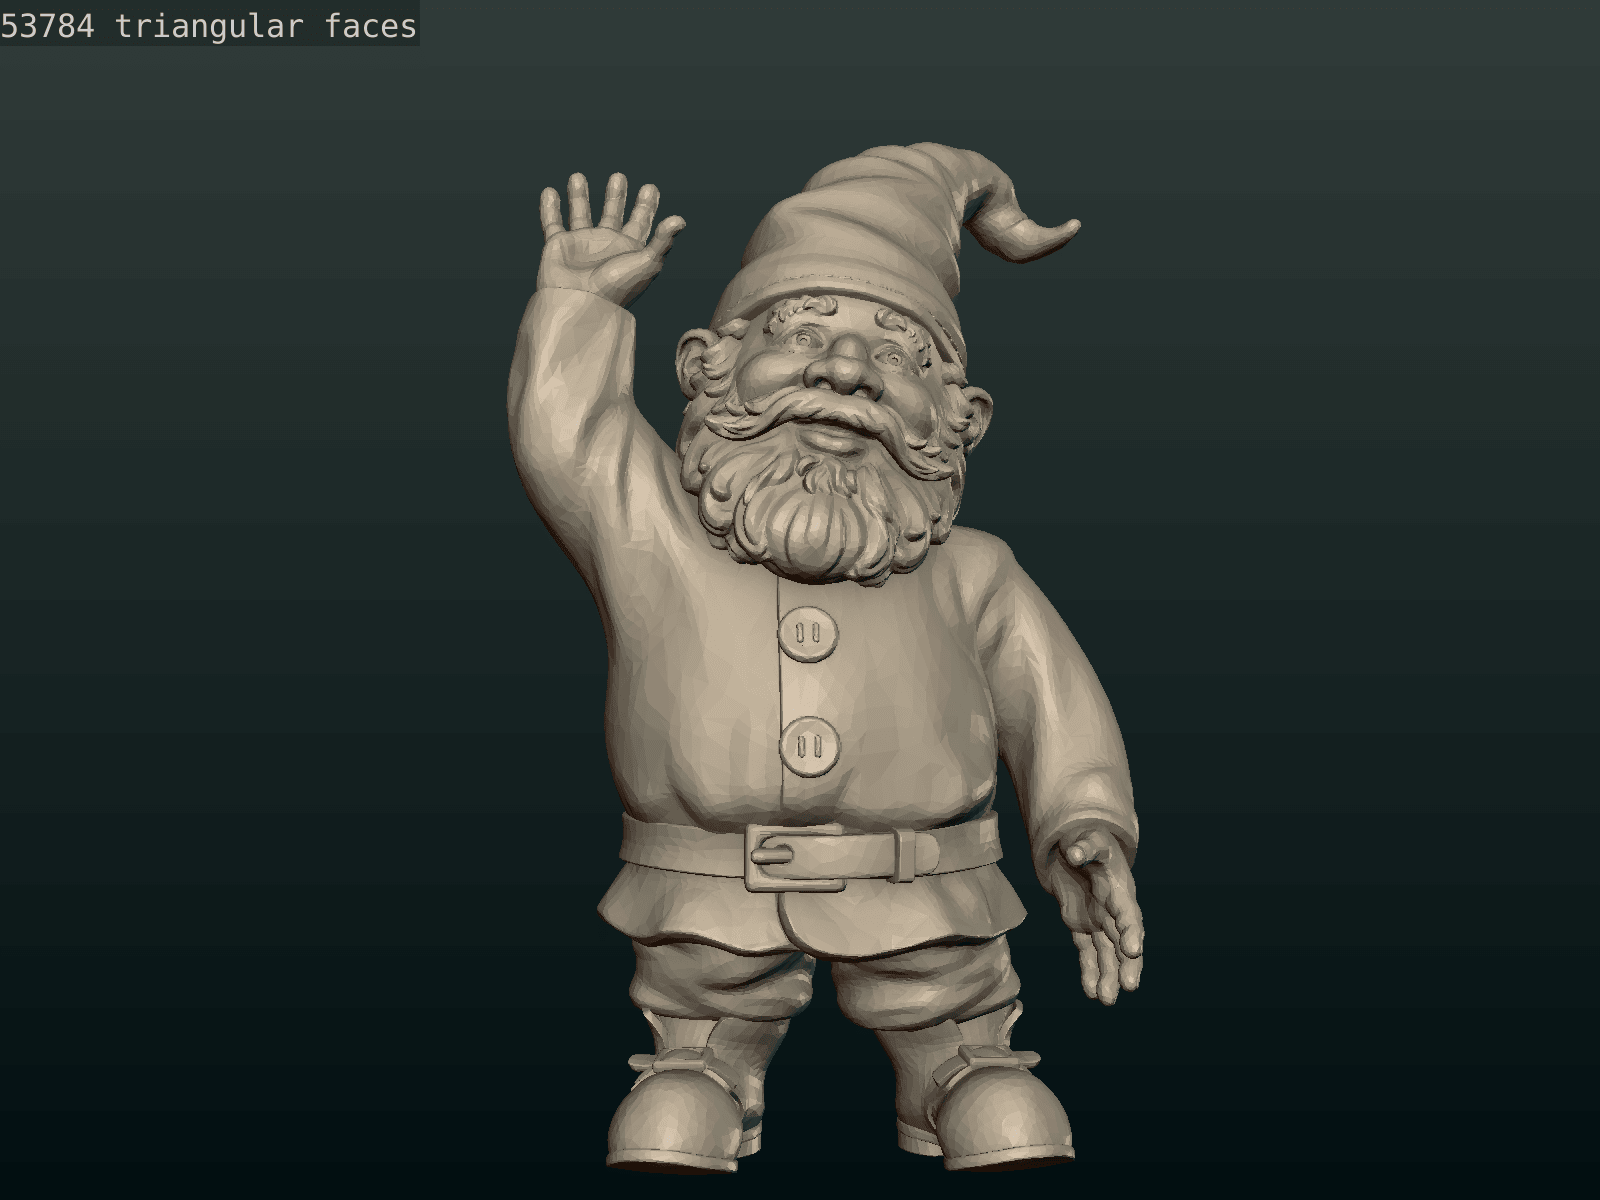 Garden_Gnome-24.png Download STL file Garden Gnome • 3D printing design, Skazok